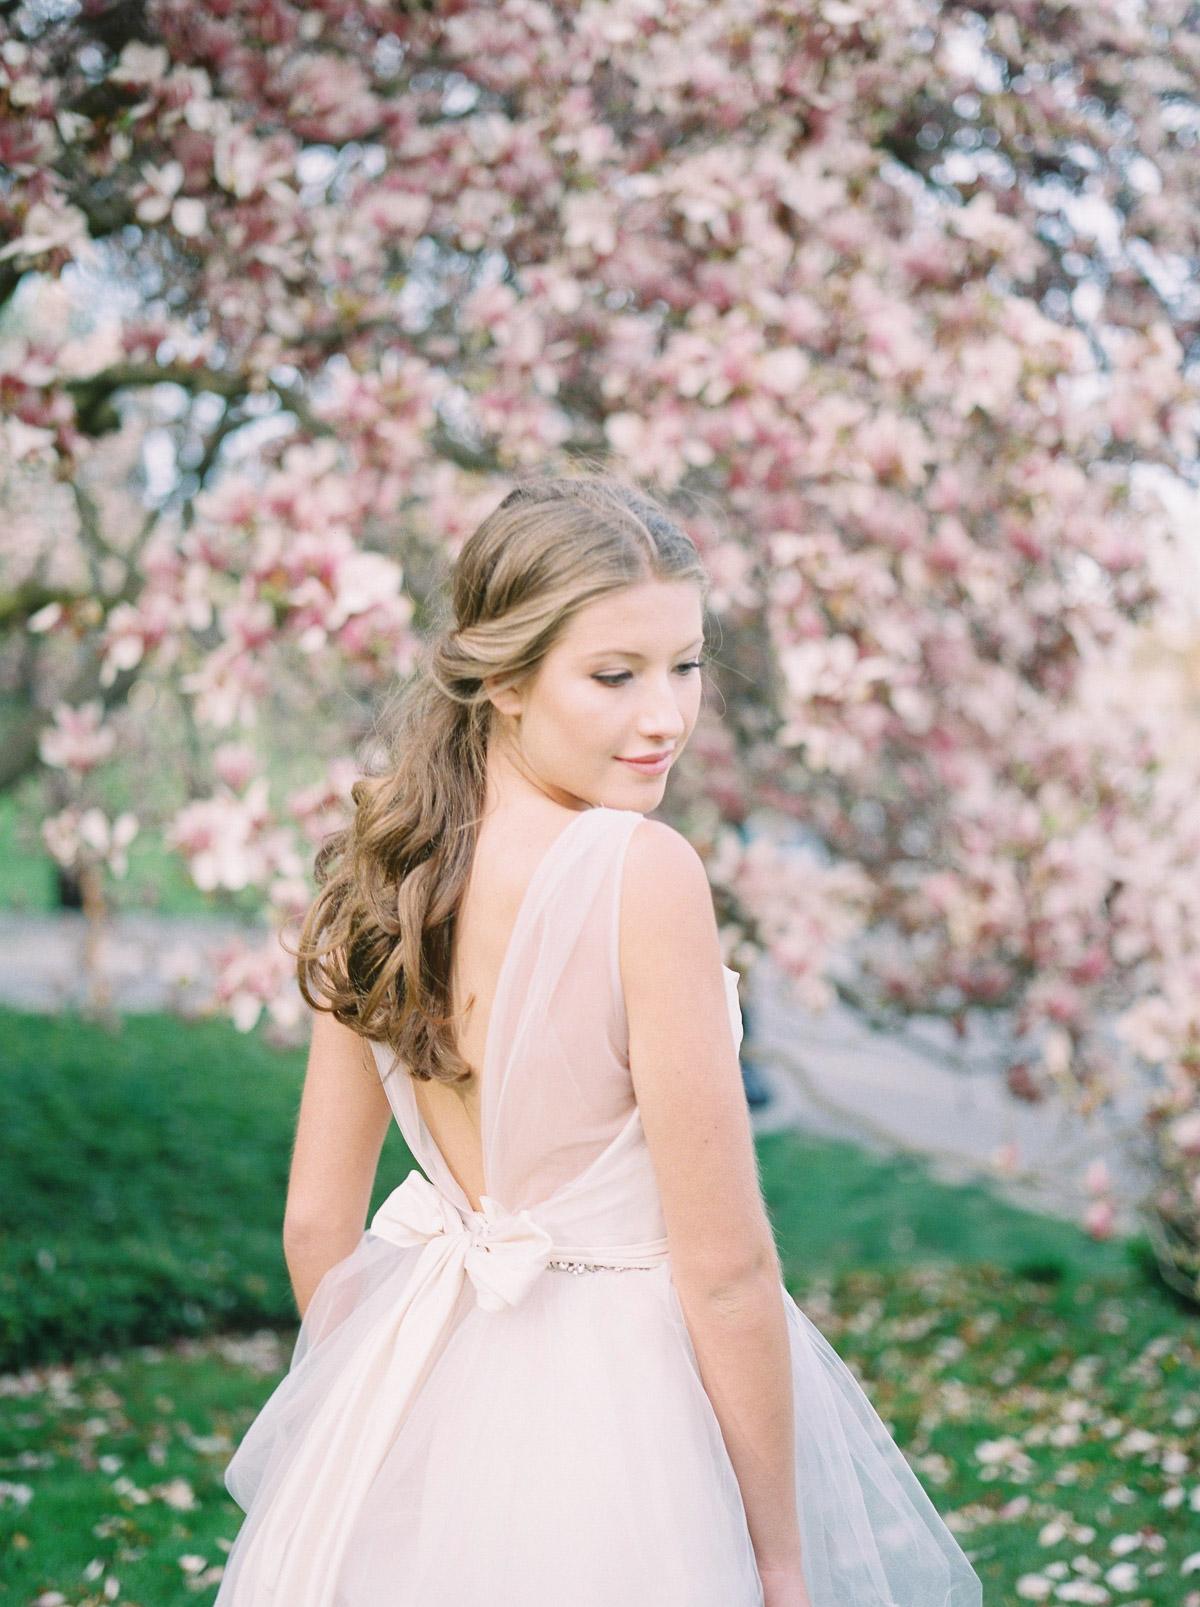 julia-park-photography-vineyard-bride-swish-list-niagara-on-the-lake-wedding-editorial-31.jpg